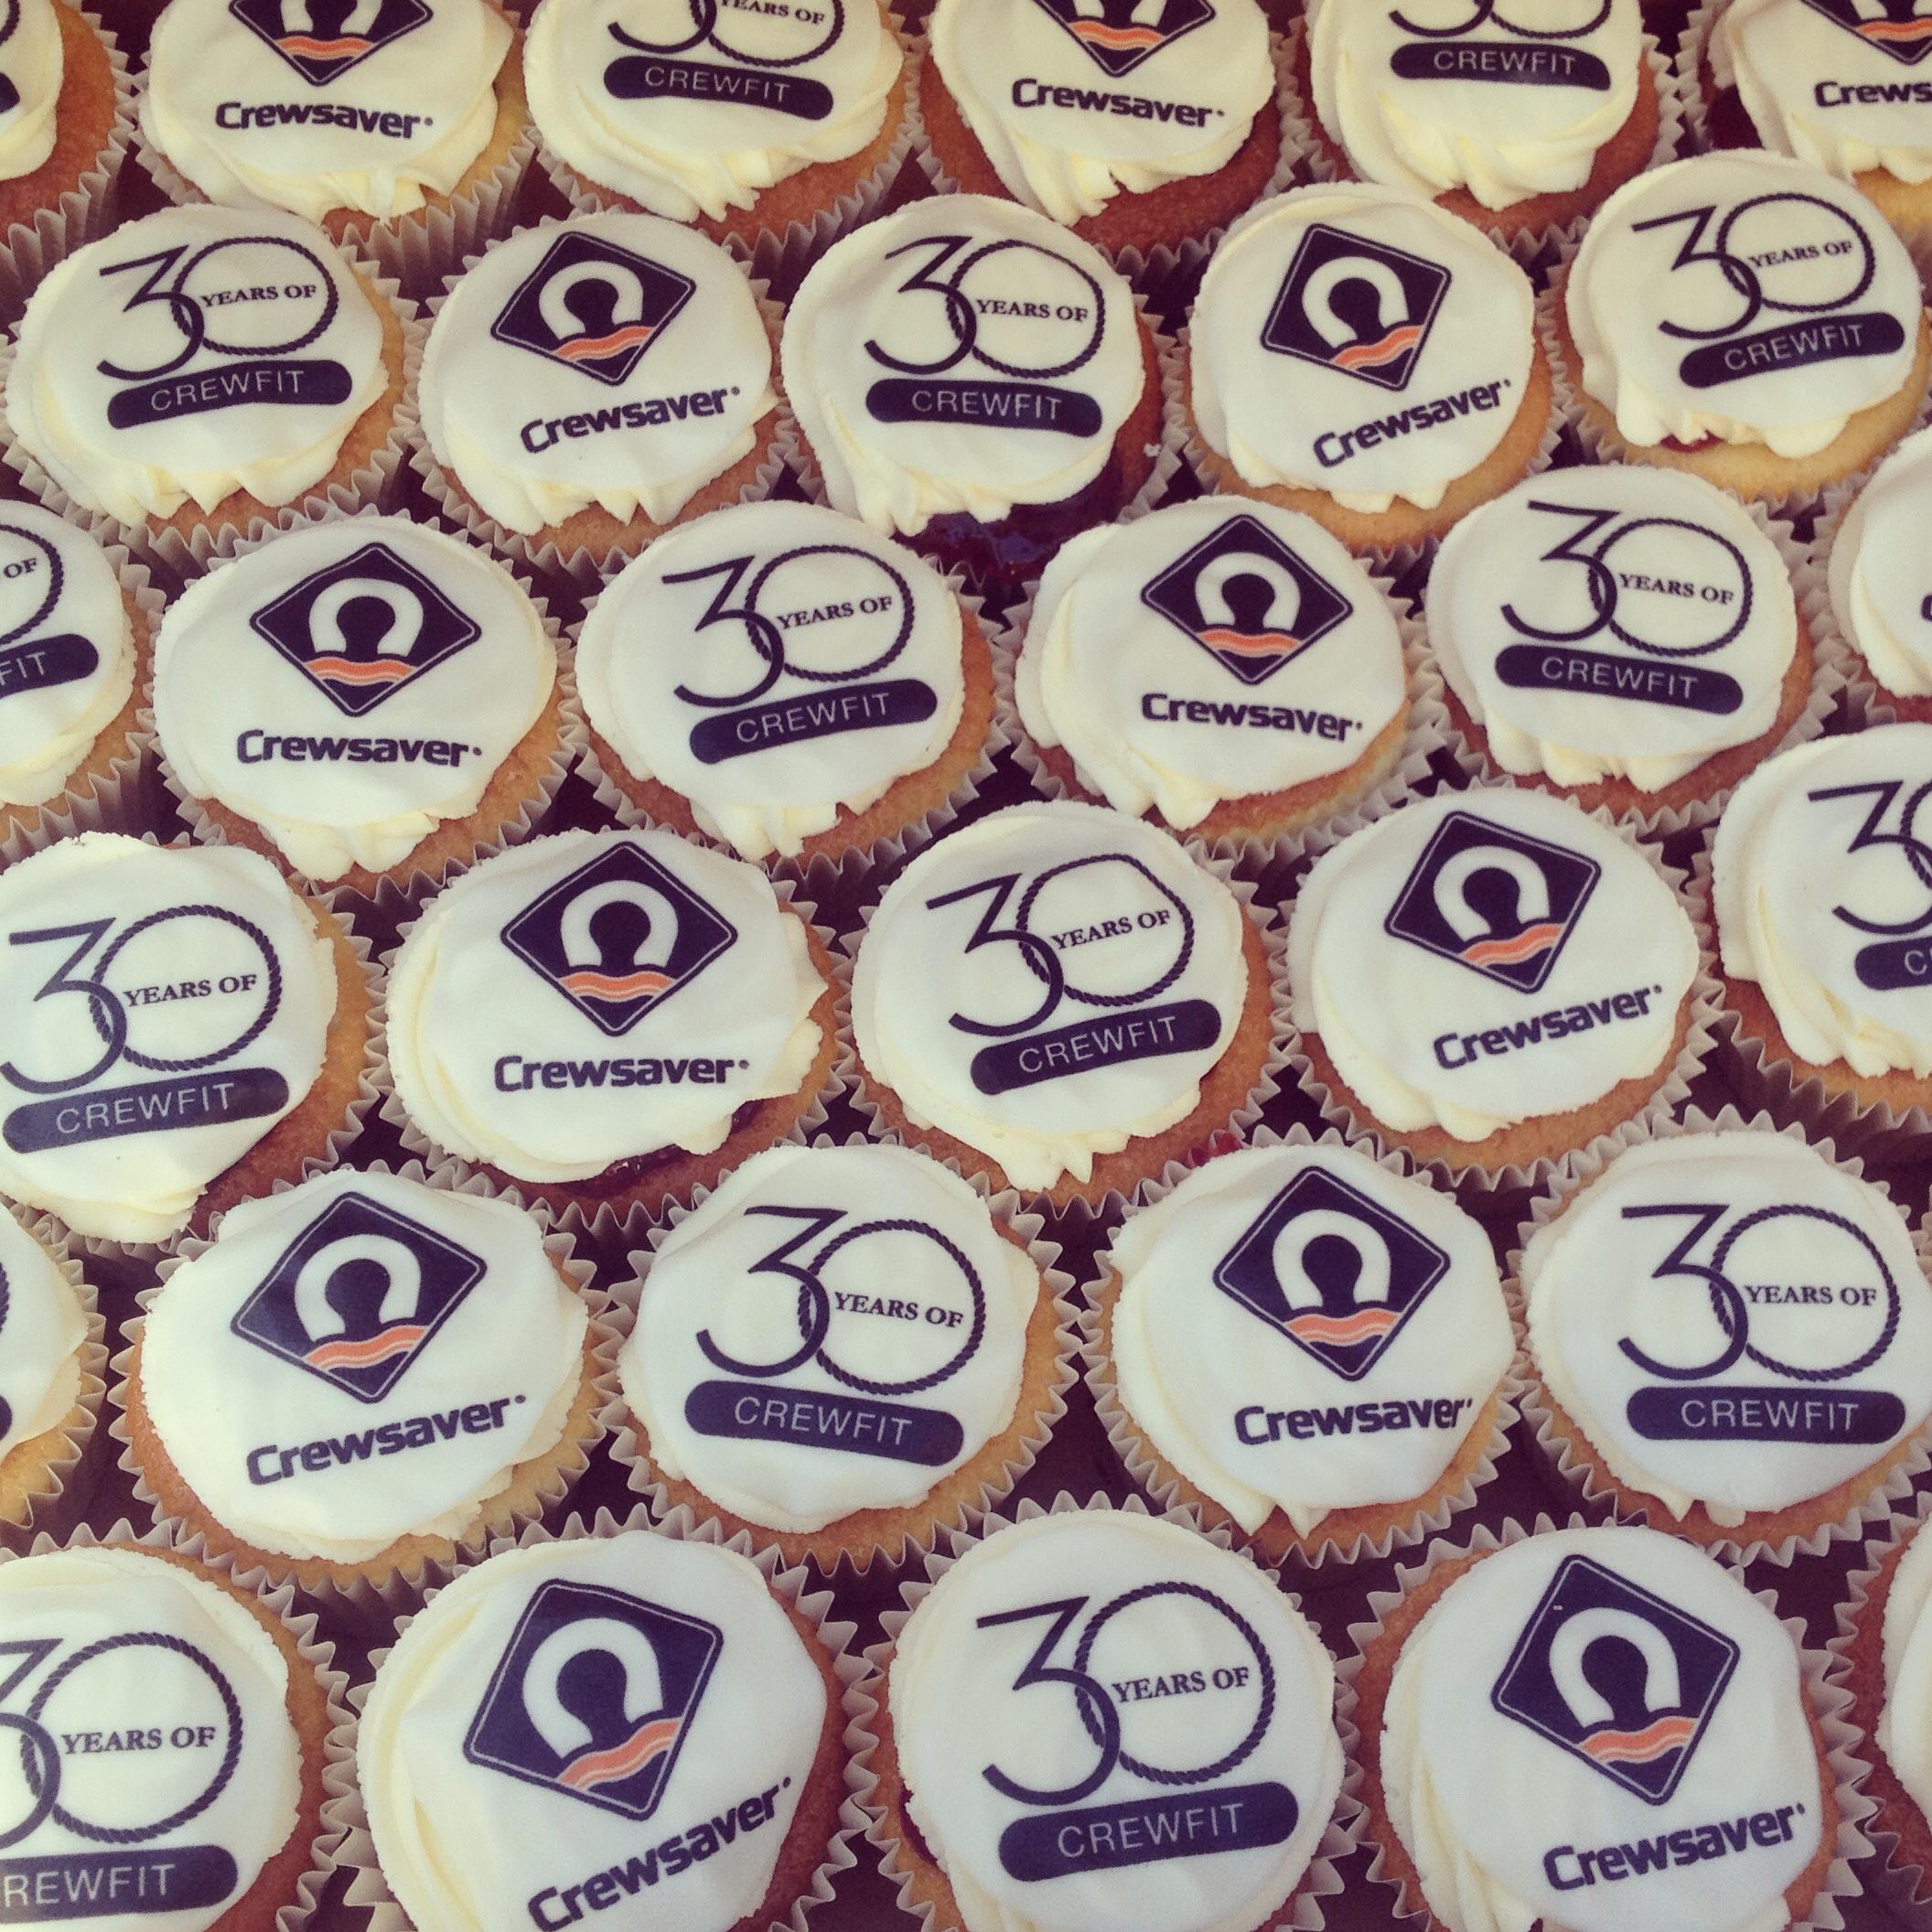 Crewsaver Corporate Cupcakes